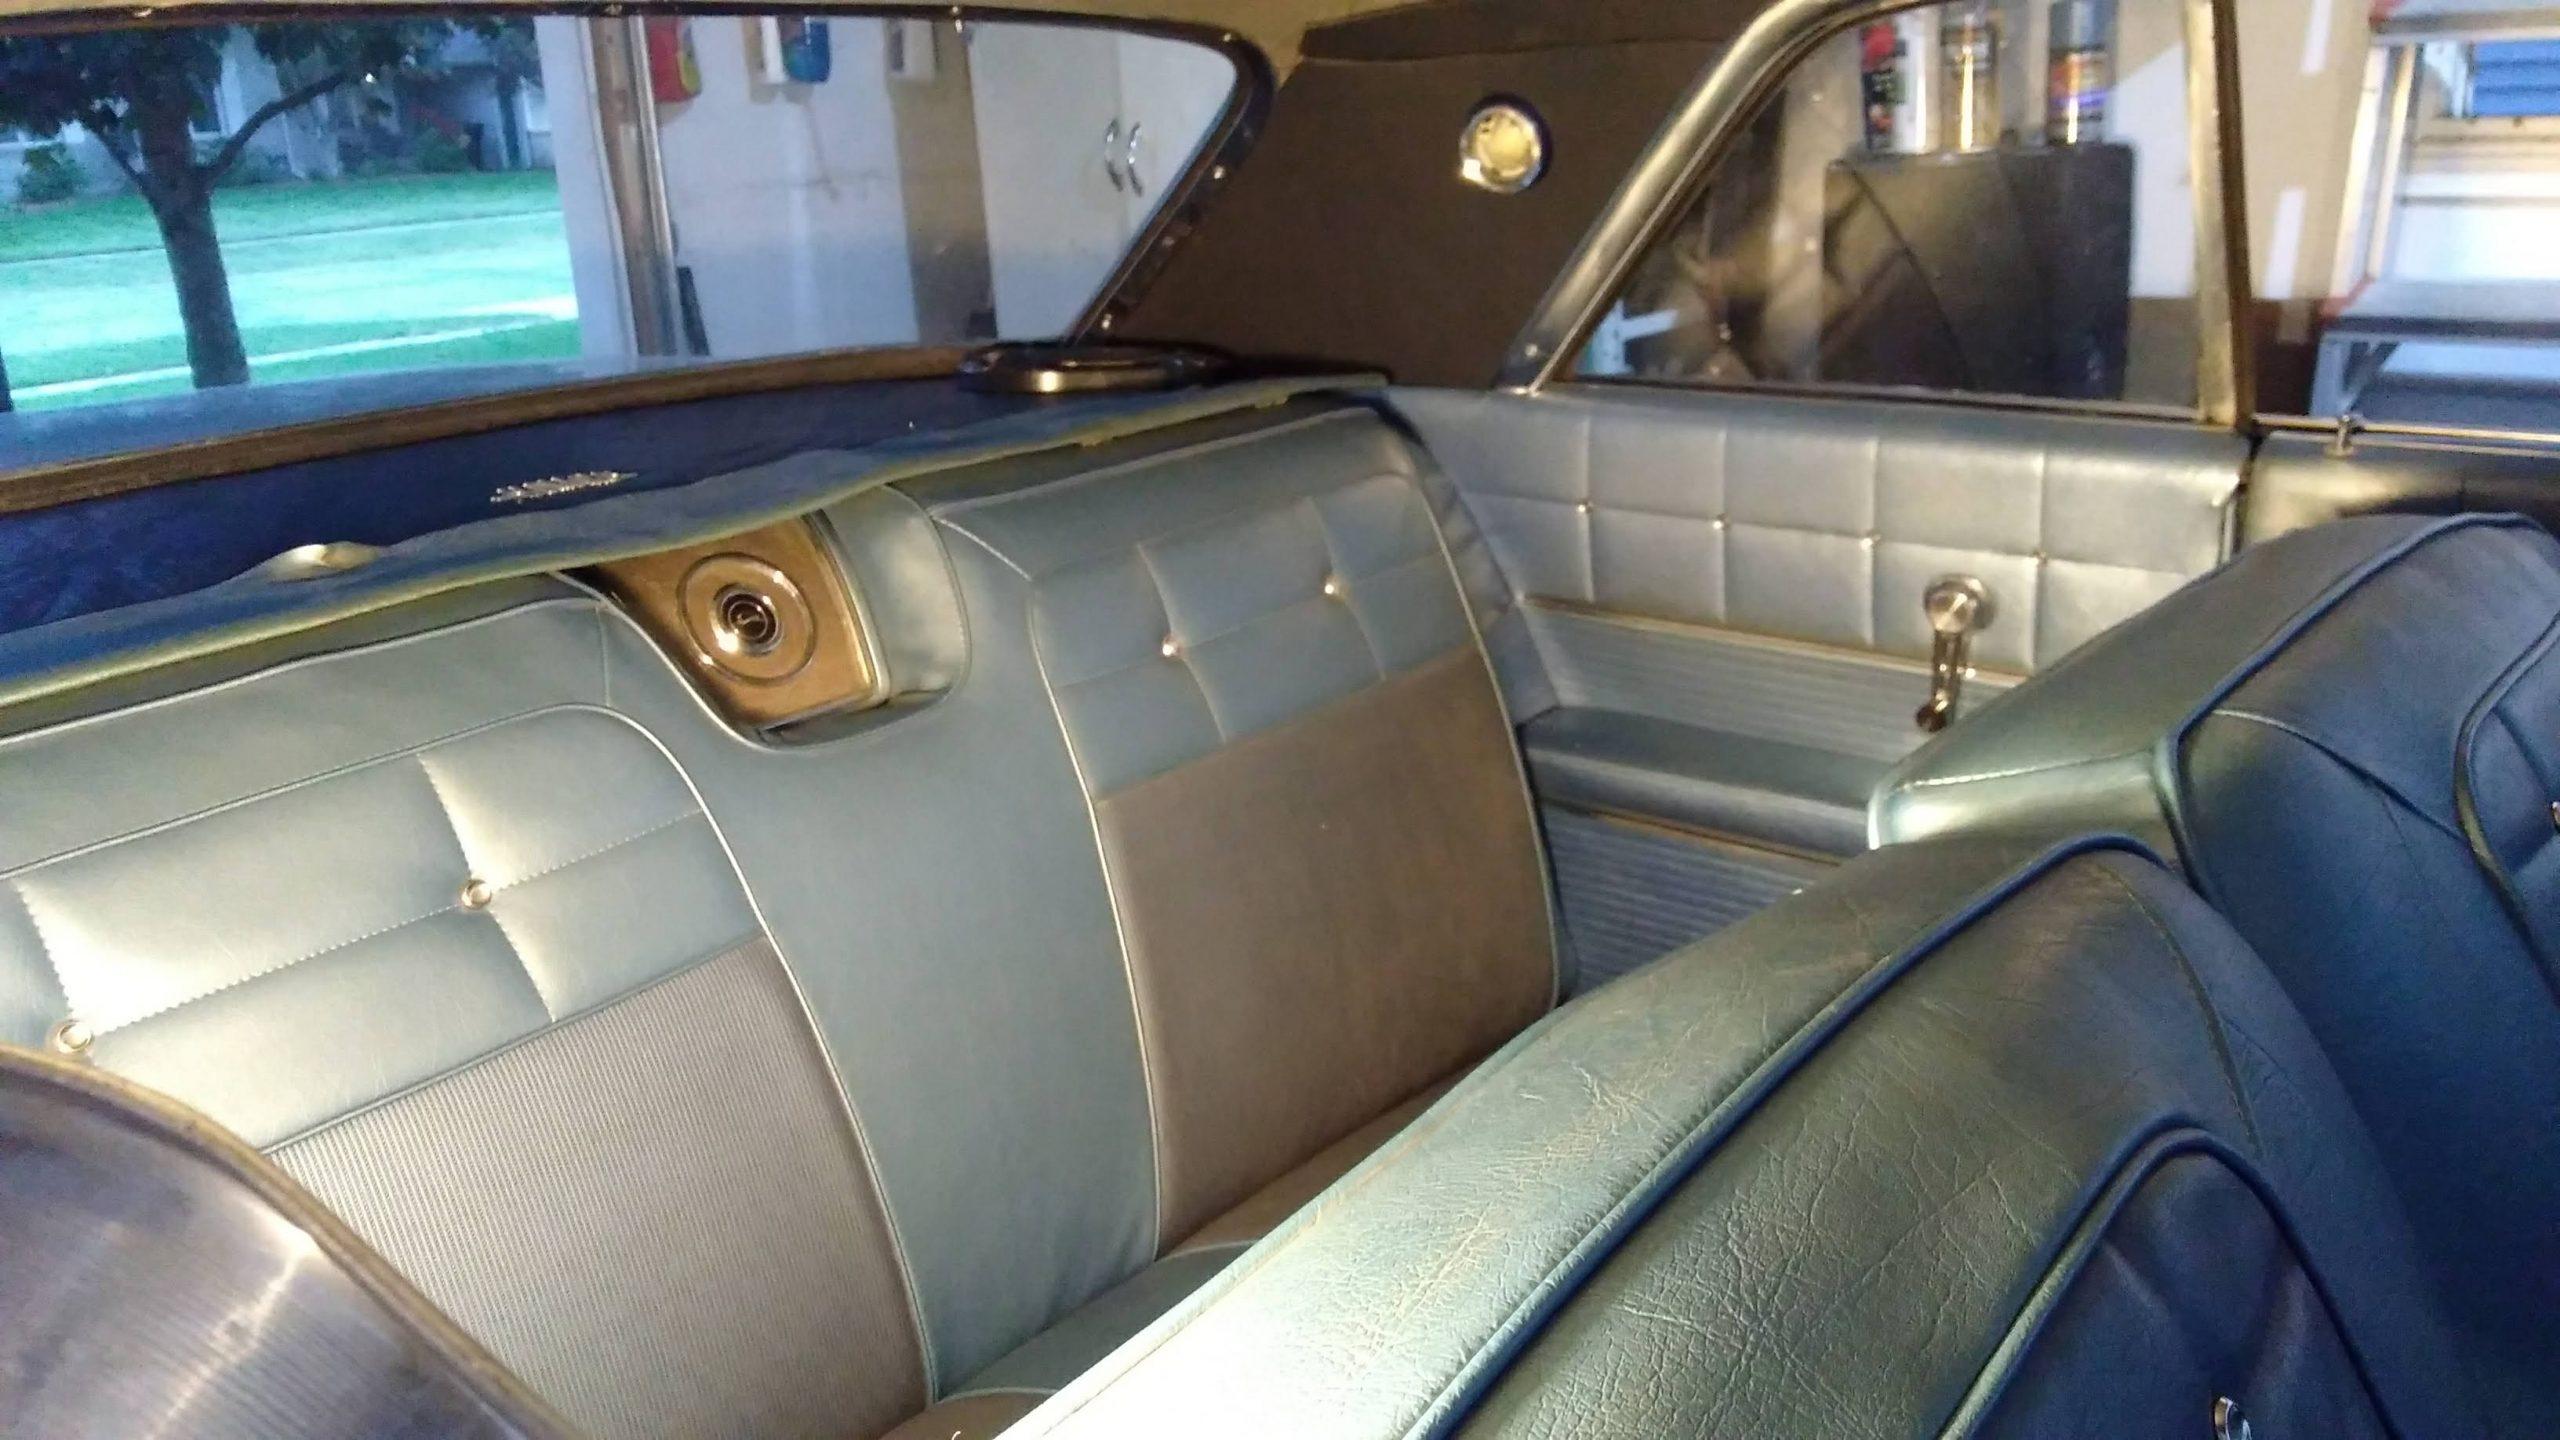 Jason Prince - 1962 Chevrolet Impala - Rear seats finished